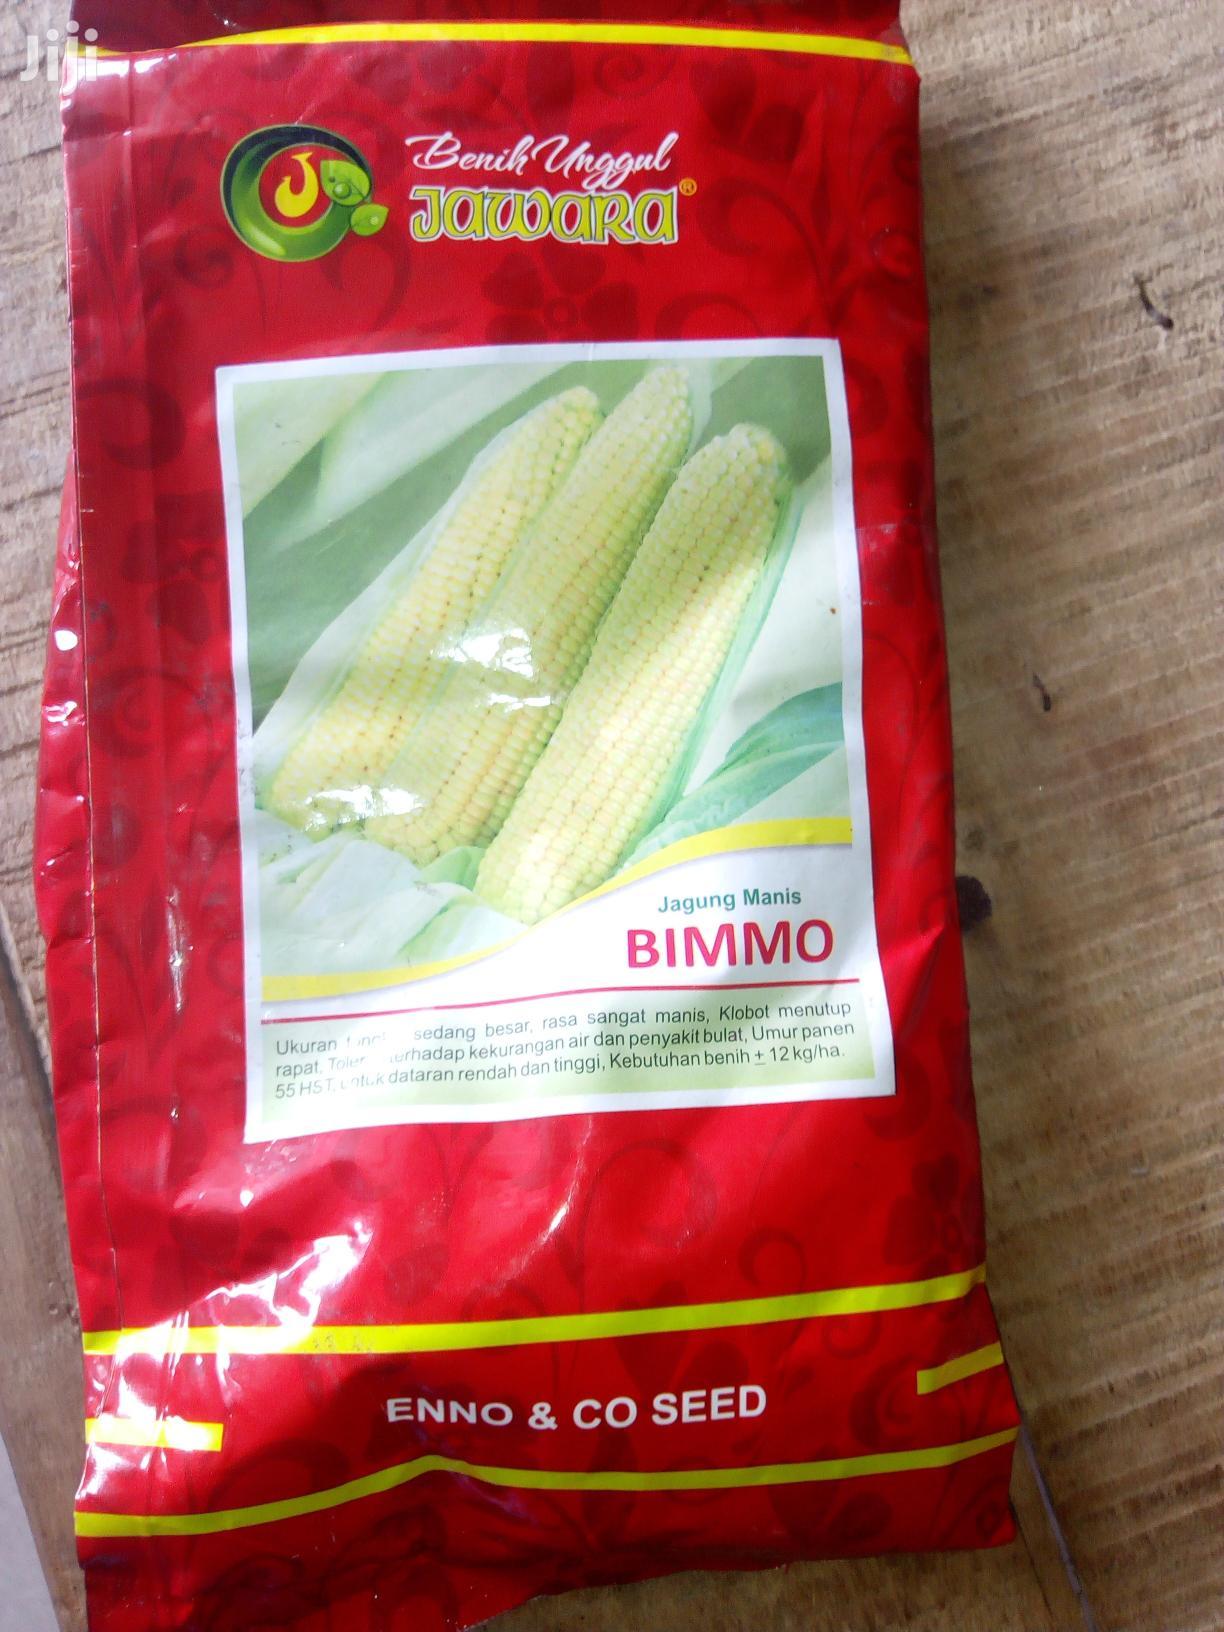 Archive: 250g Bimmo Sweet Corn Seed